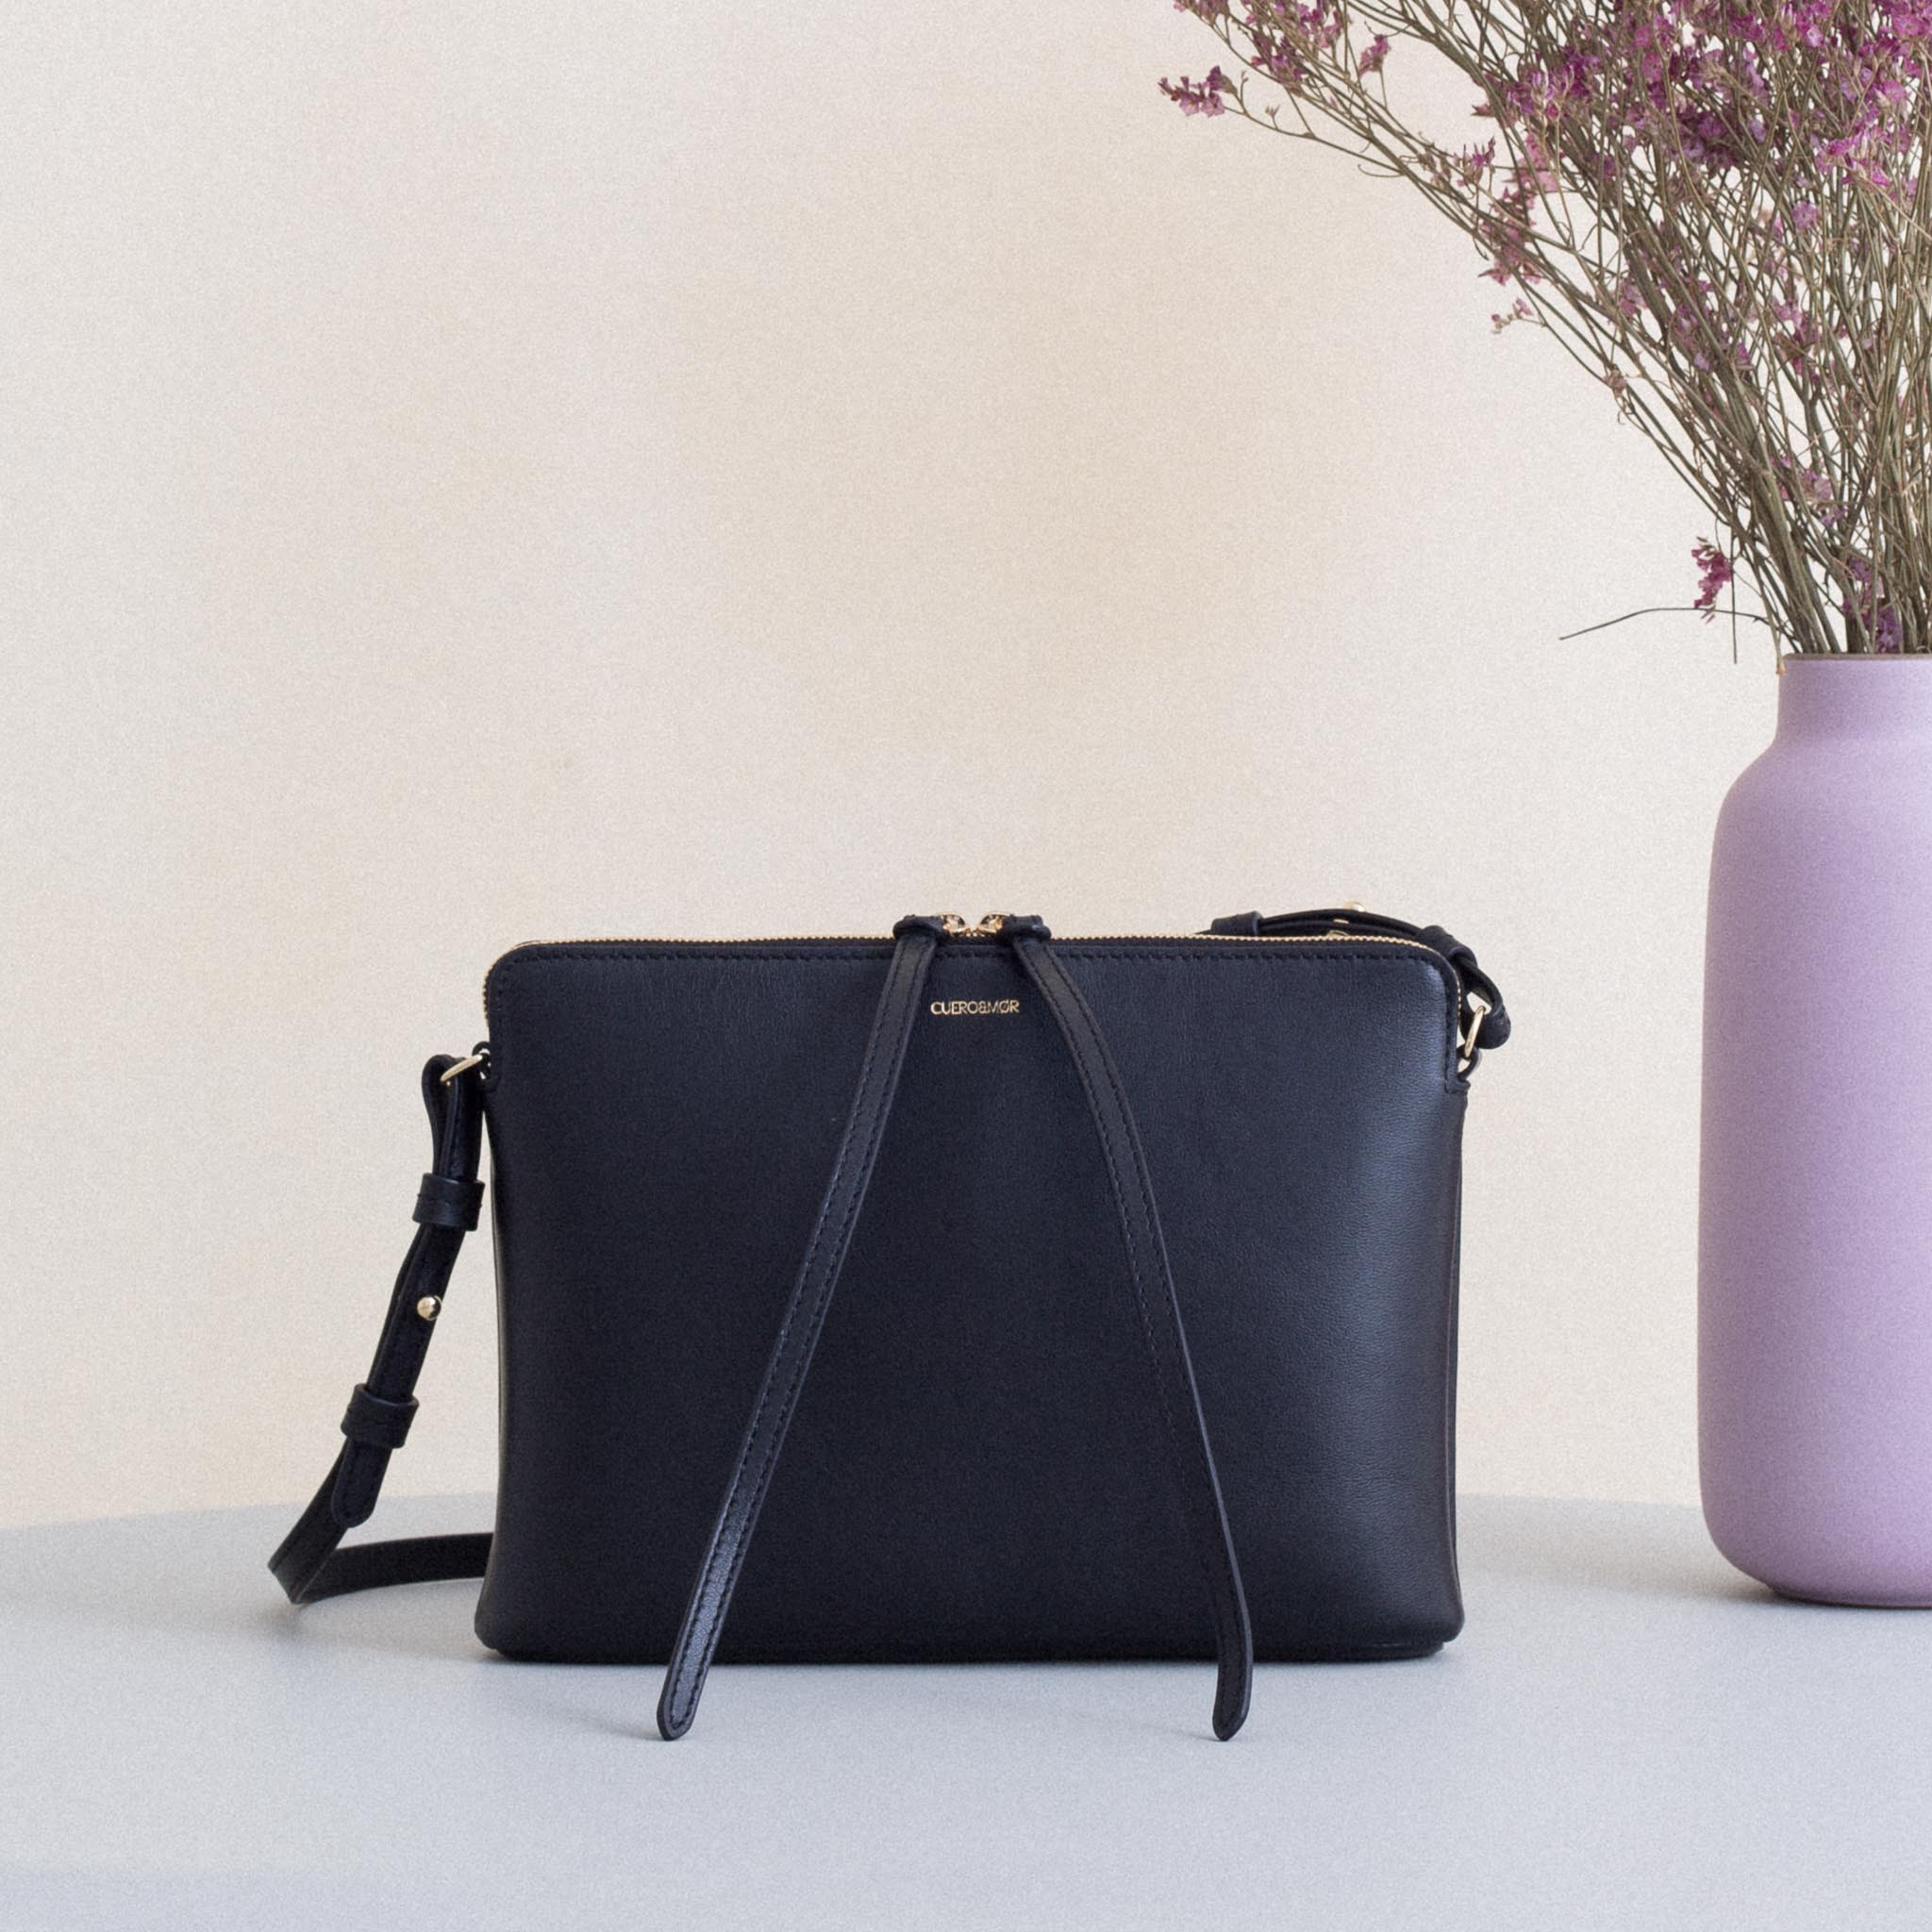 Top Zipper Bag - Black (ONLY 1)